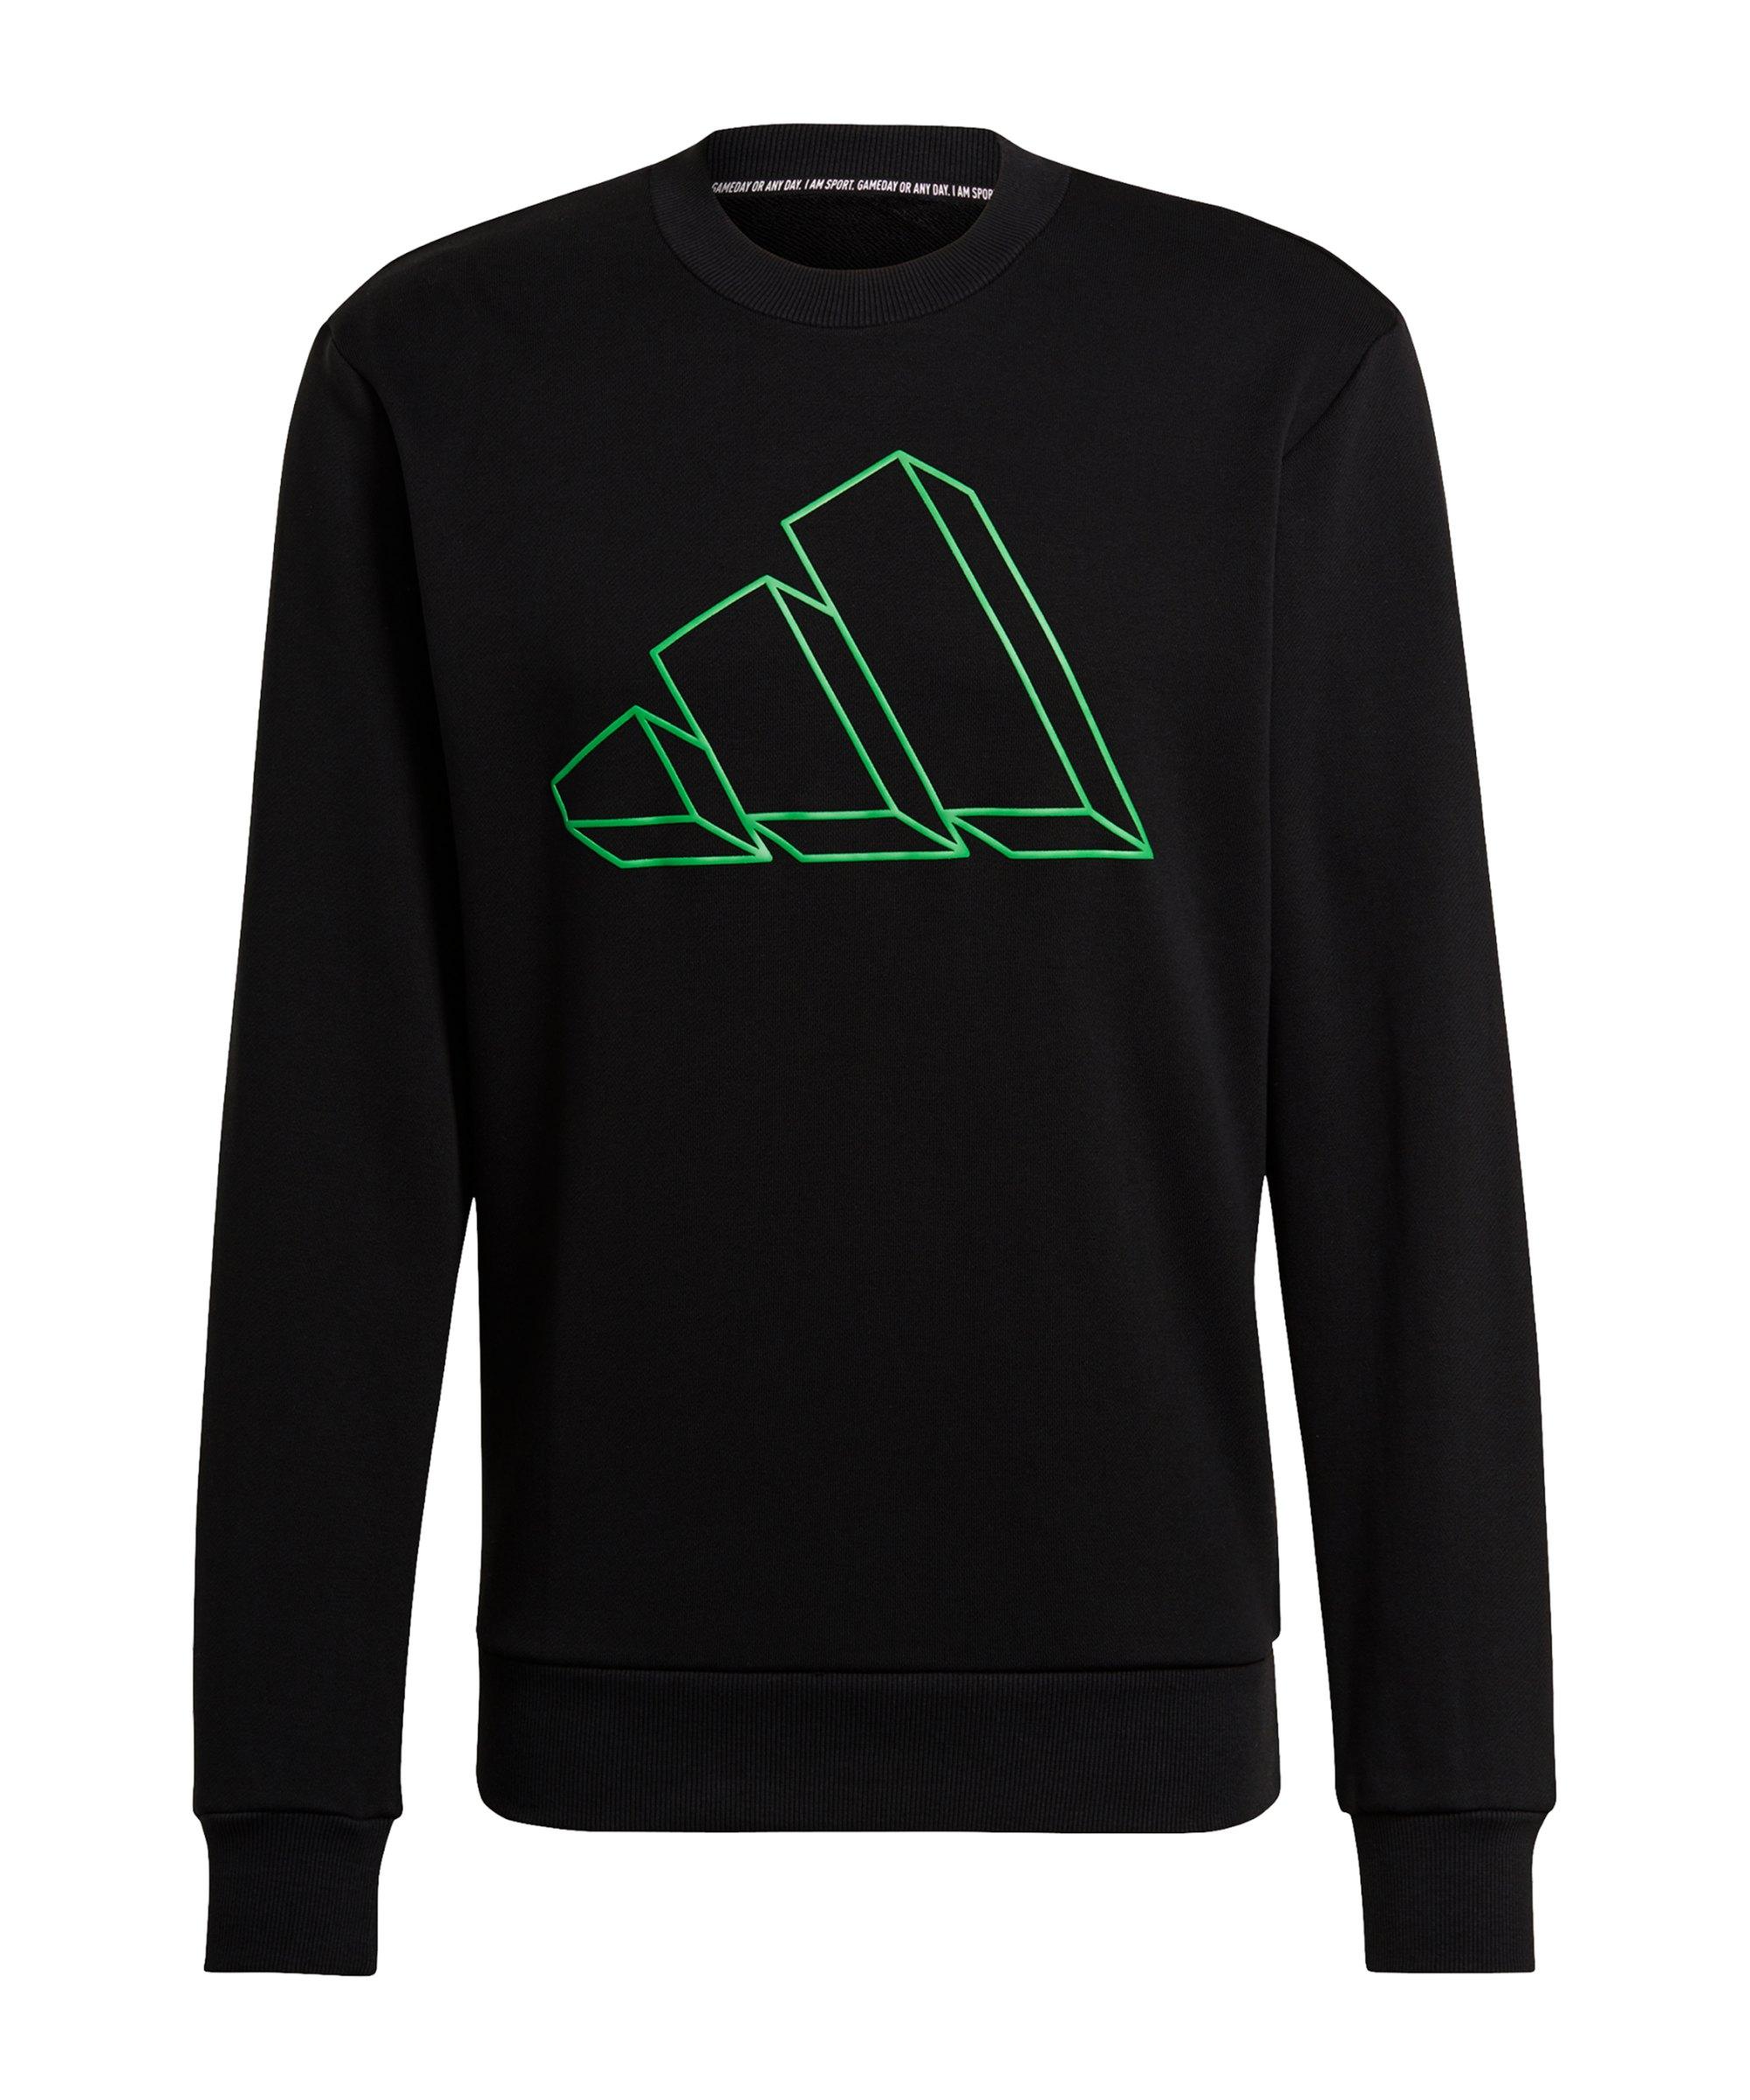 adidas GFX Crew Sweatshirt Schwarz - schwarz